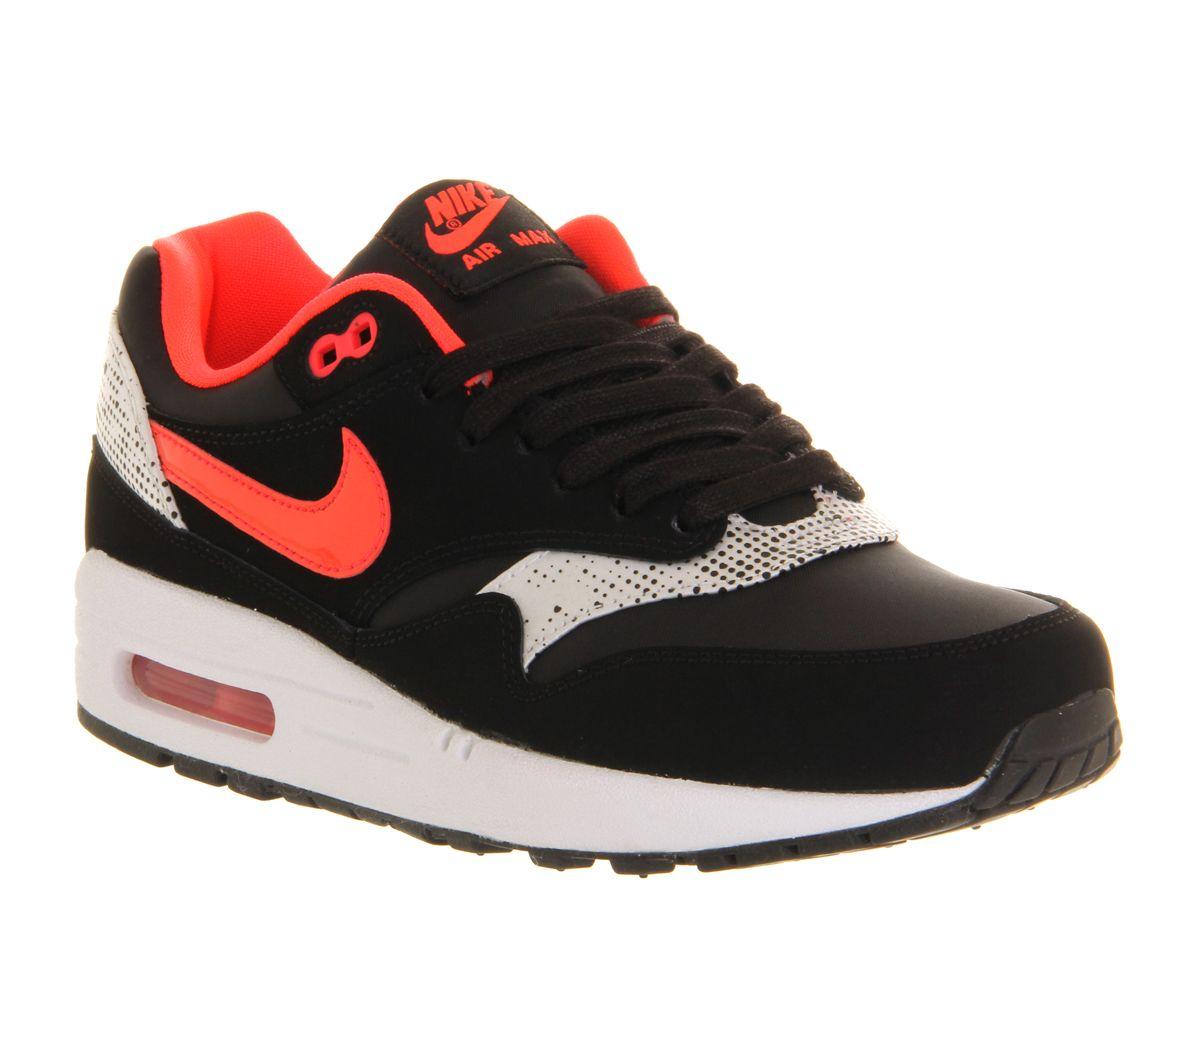 Nike Air Max 1 (l) Black Laser Crimson White Hers trainers